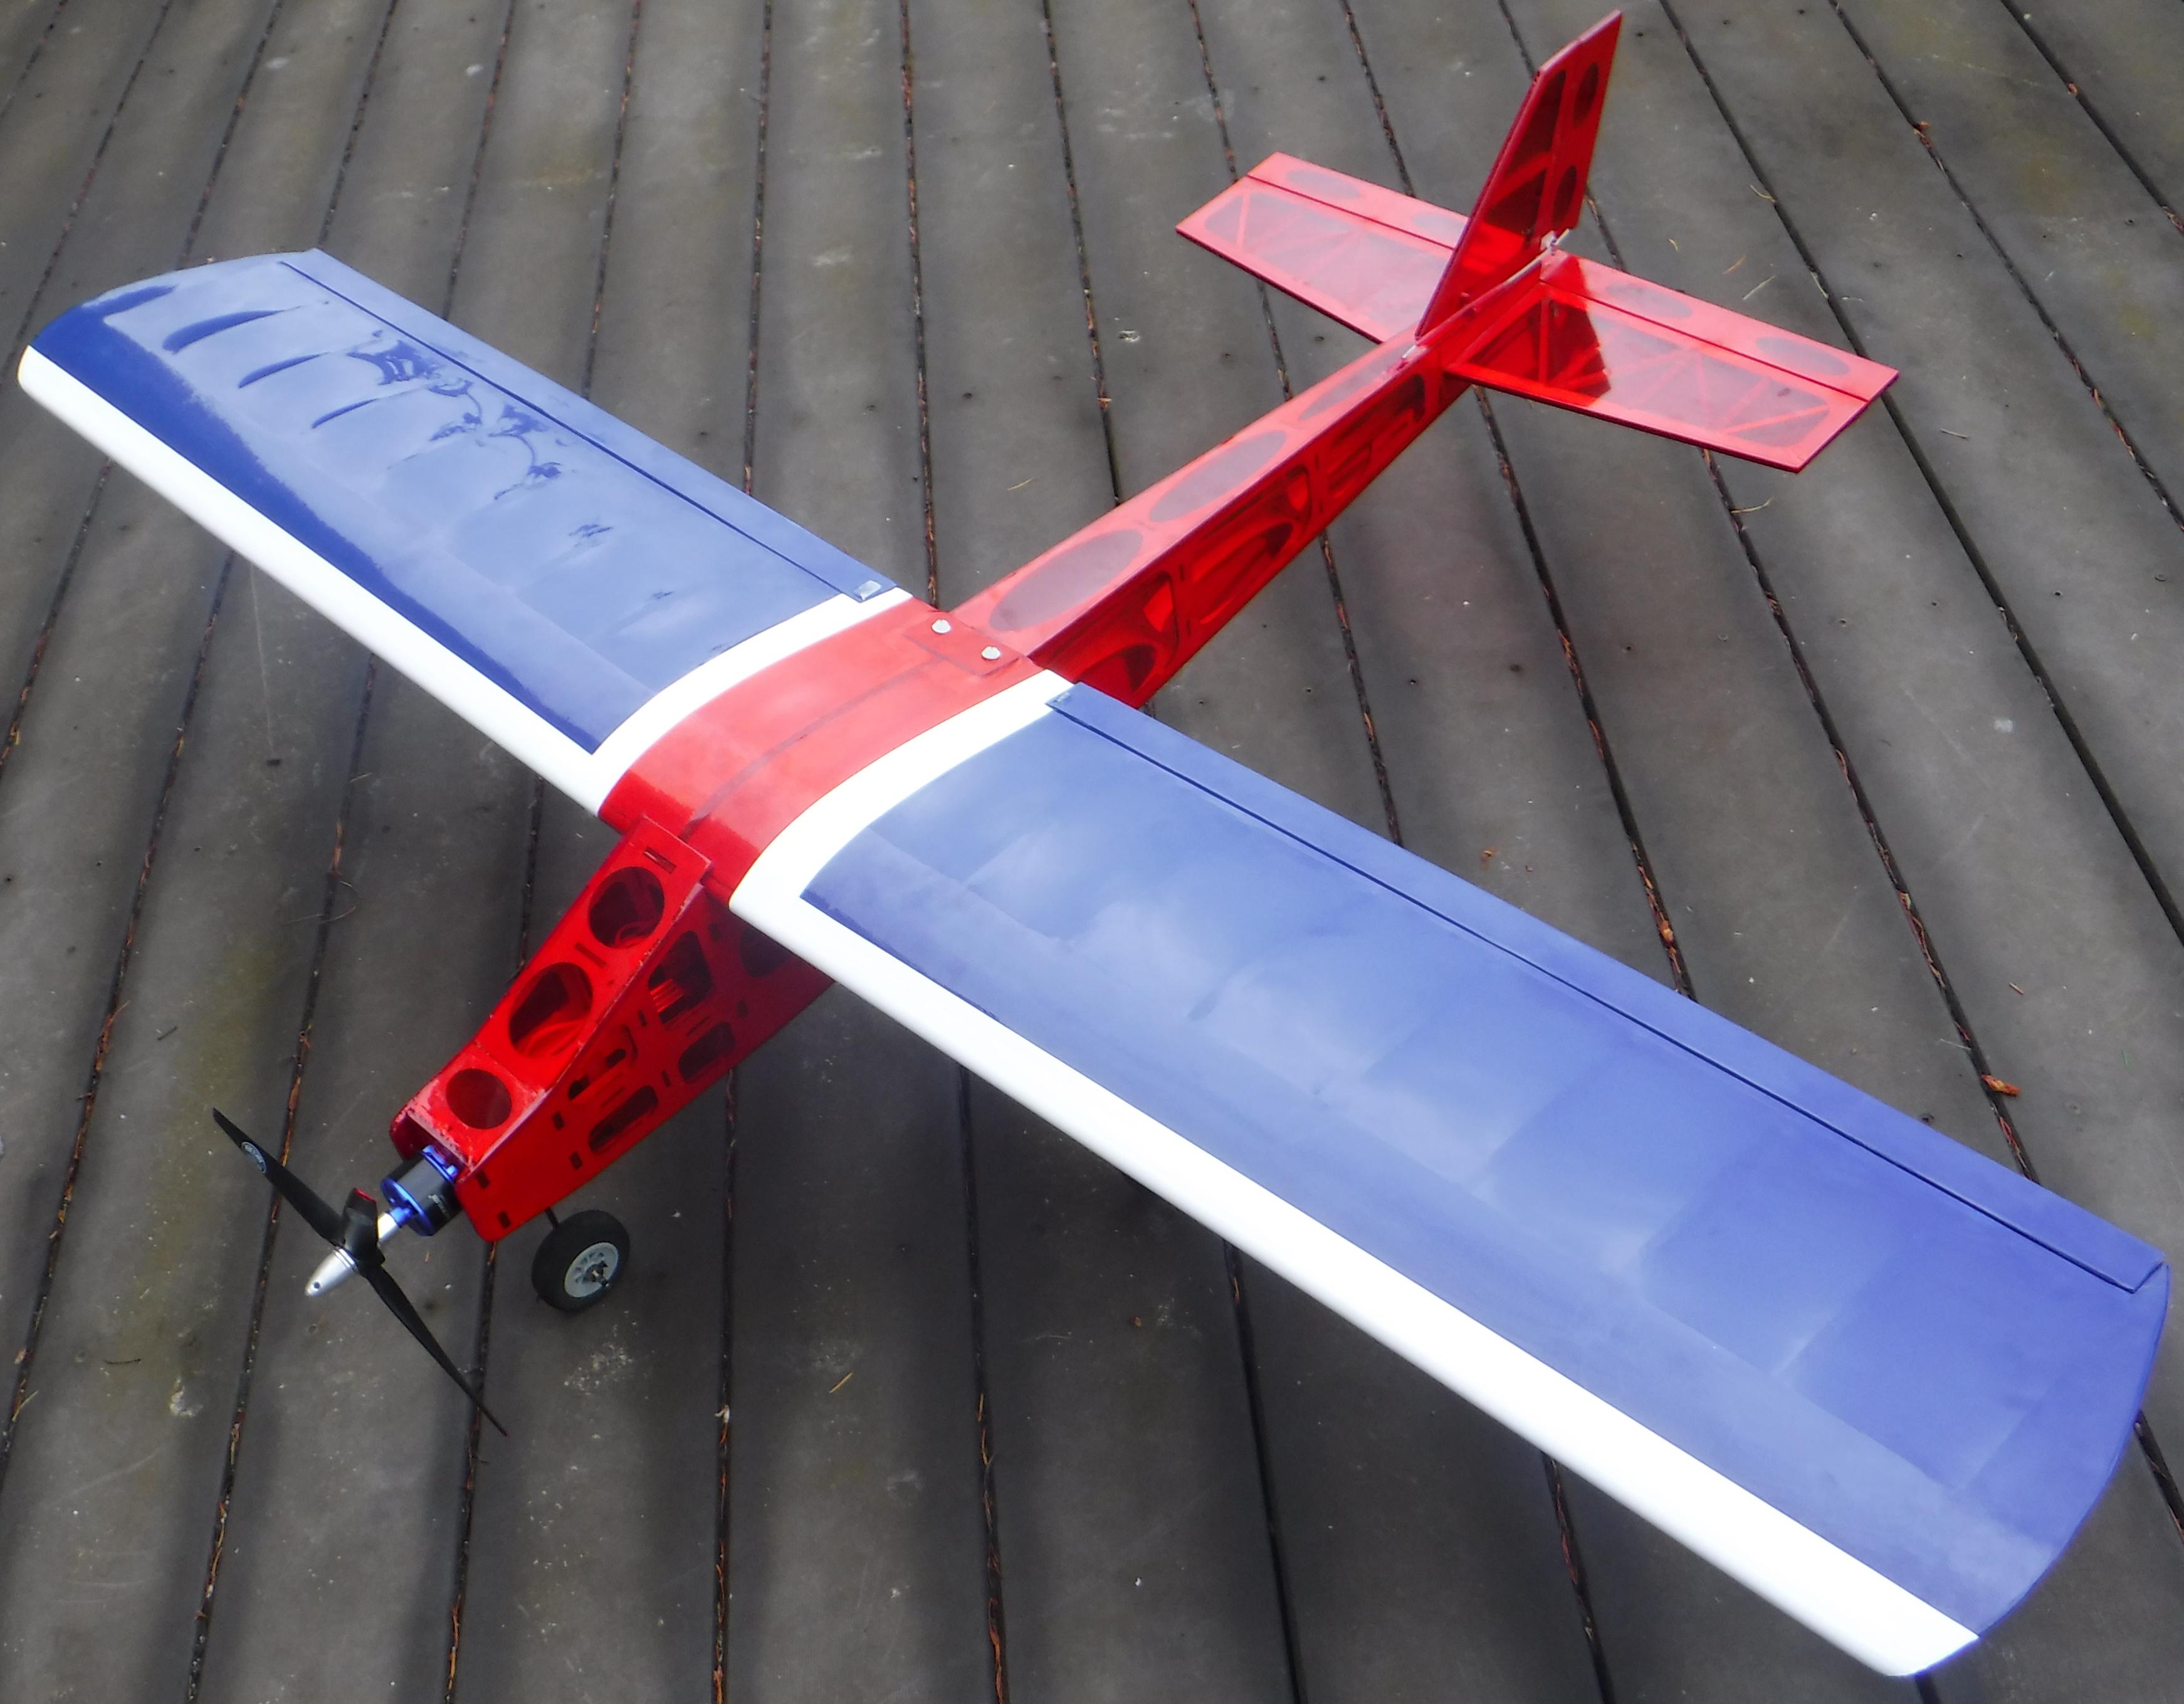 Cloud Dancer Trainer Balsa Laser Cut Airplane Kit Kit